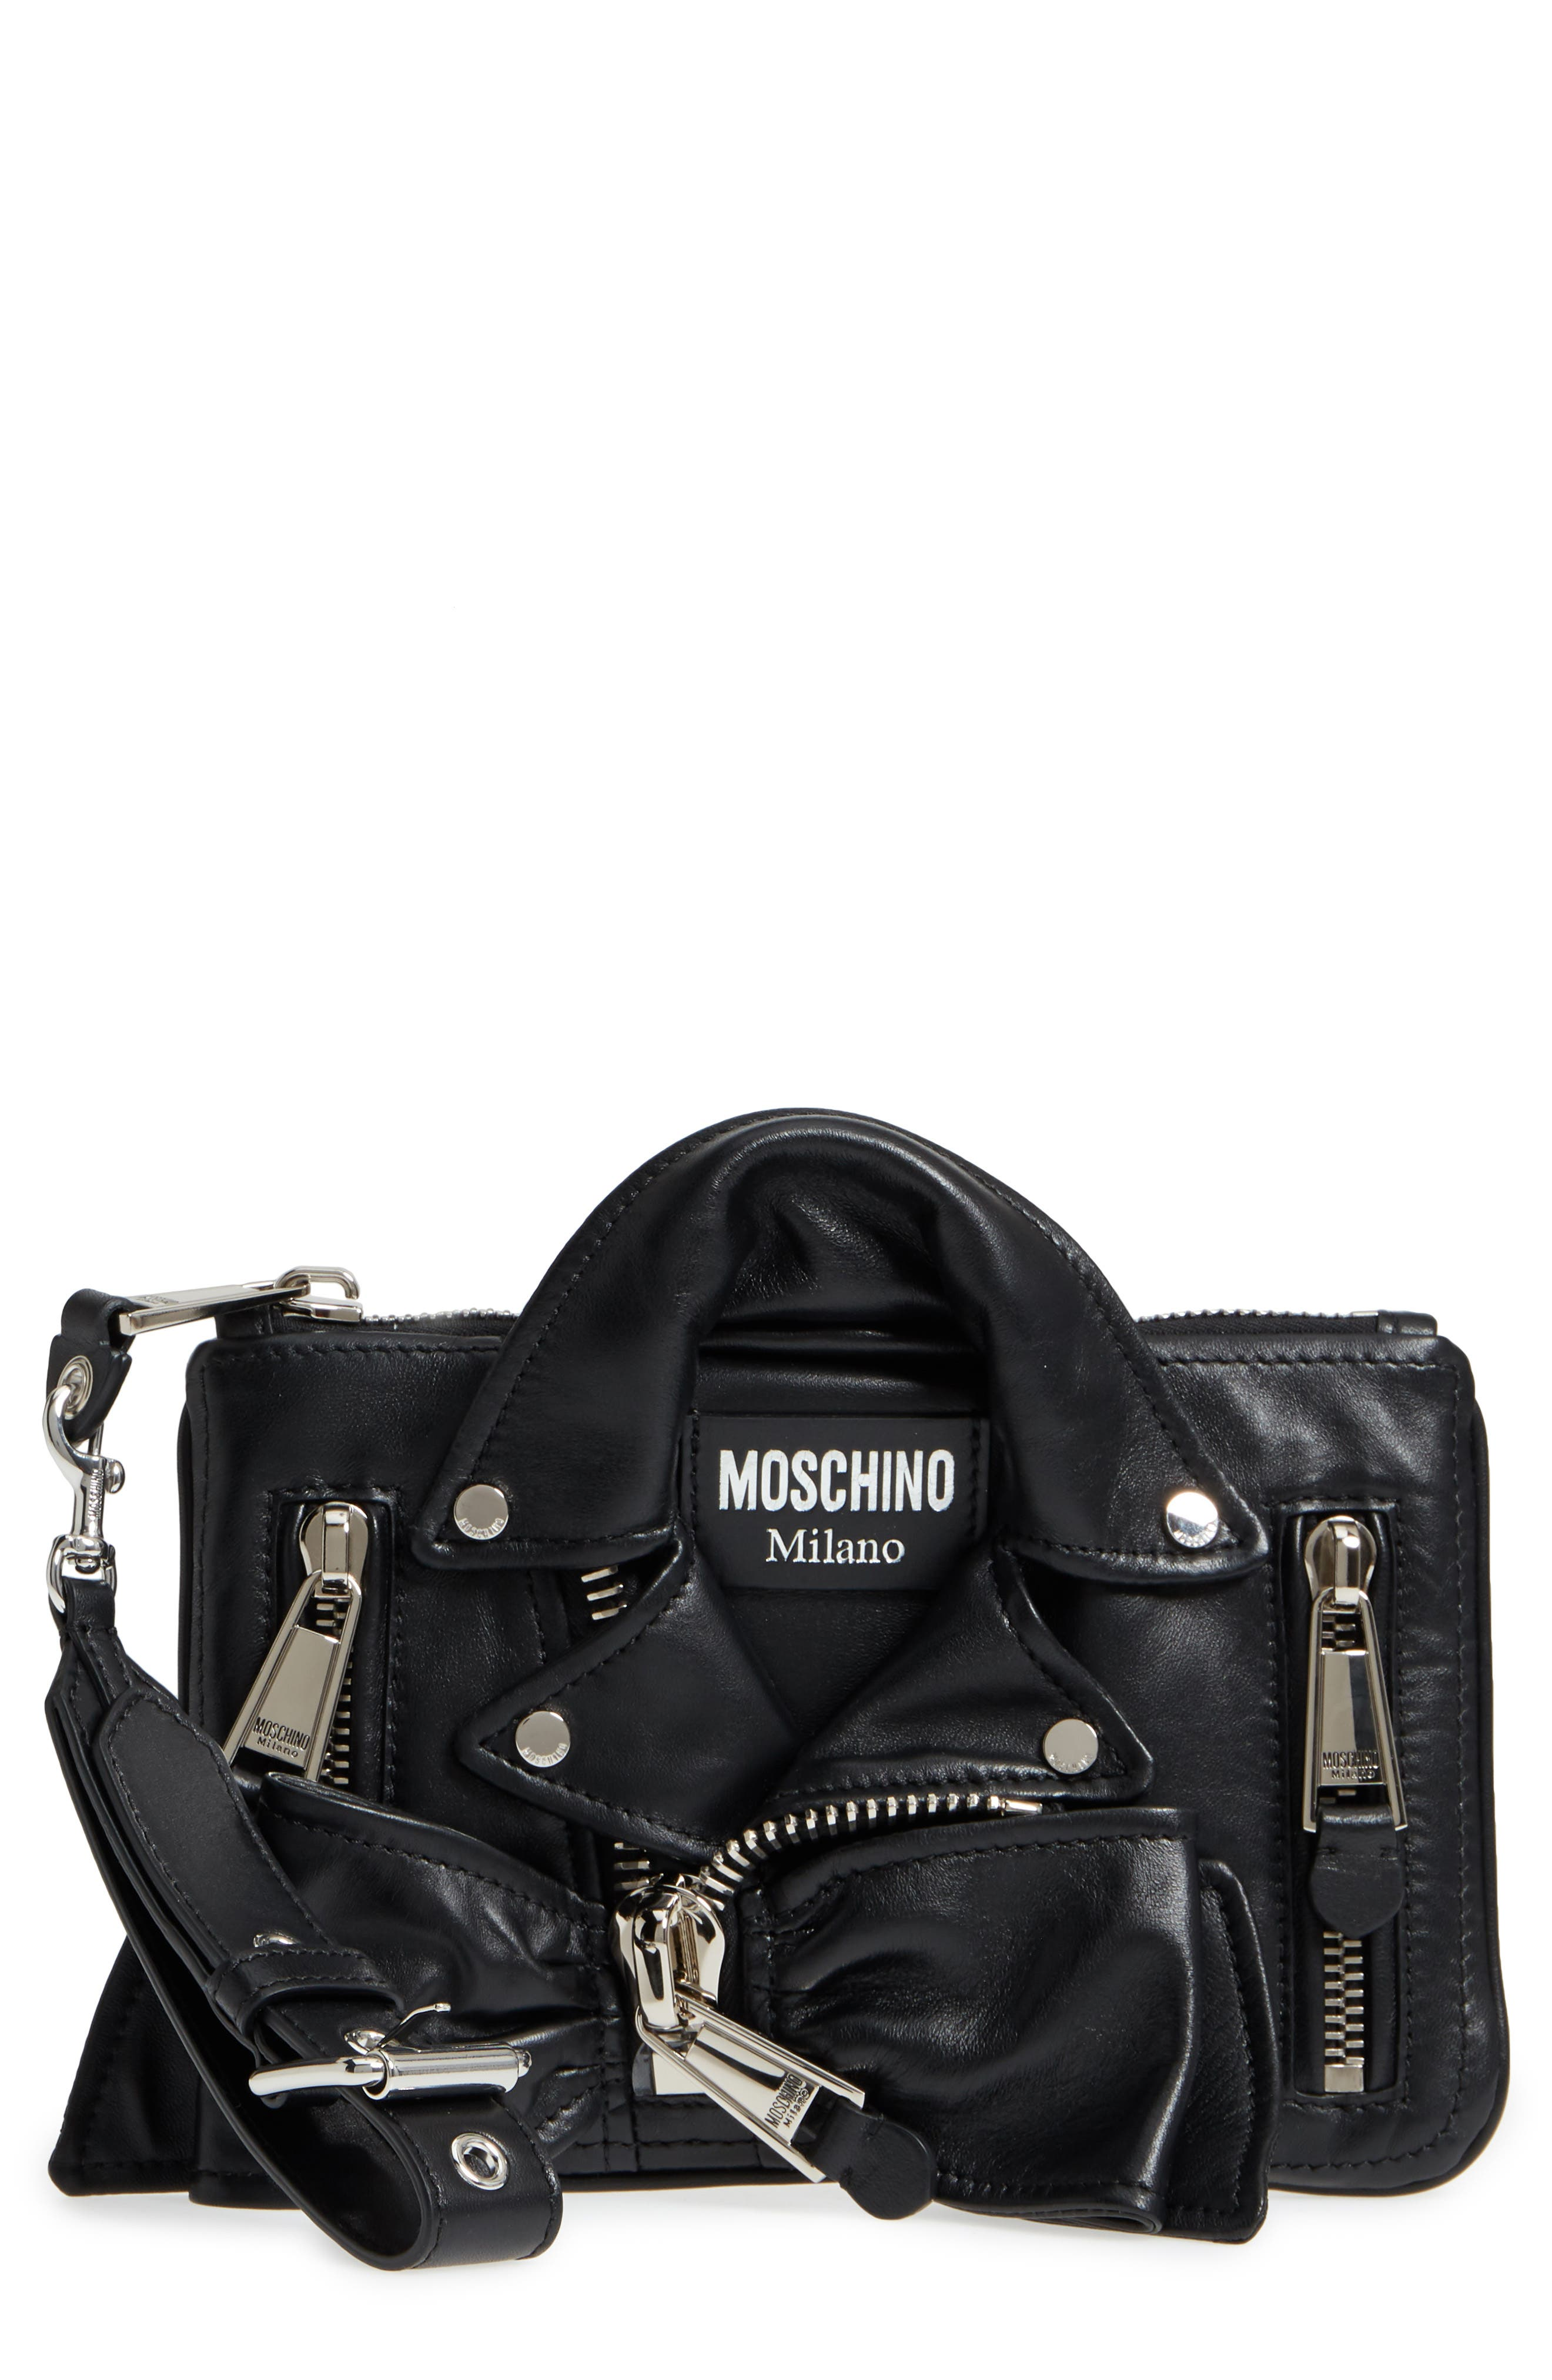 Moschino Biker Jacket Leather Wristlet